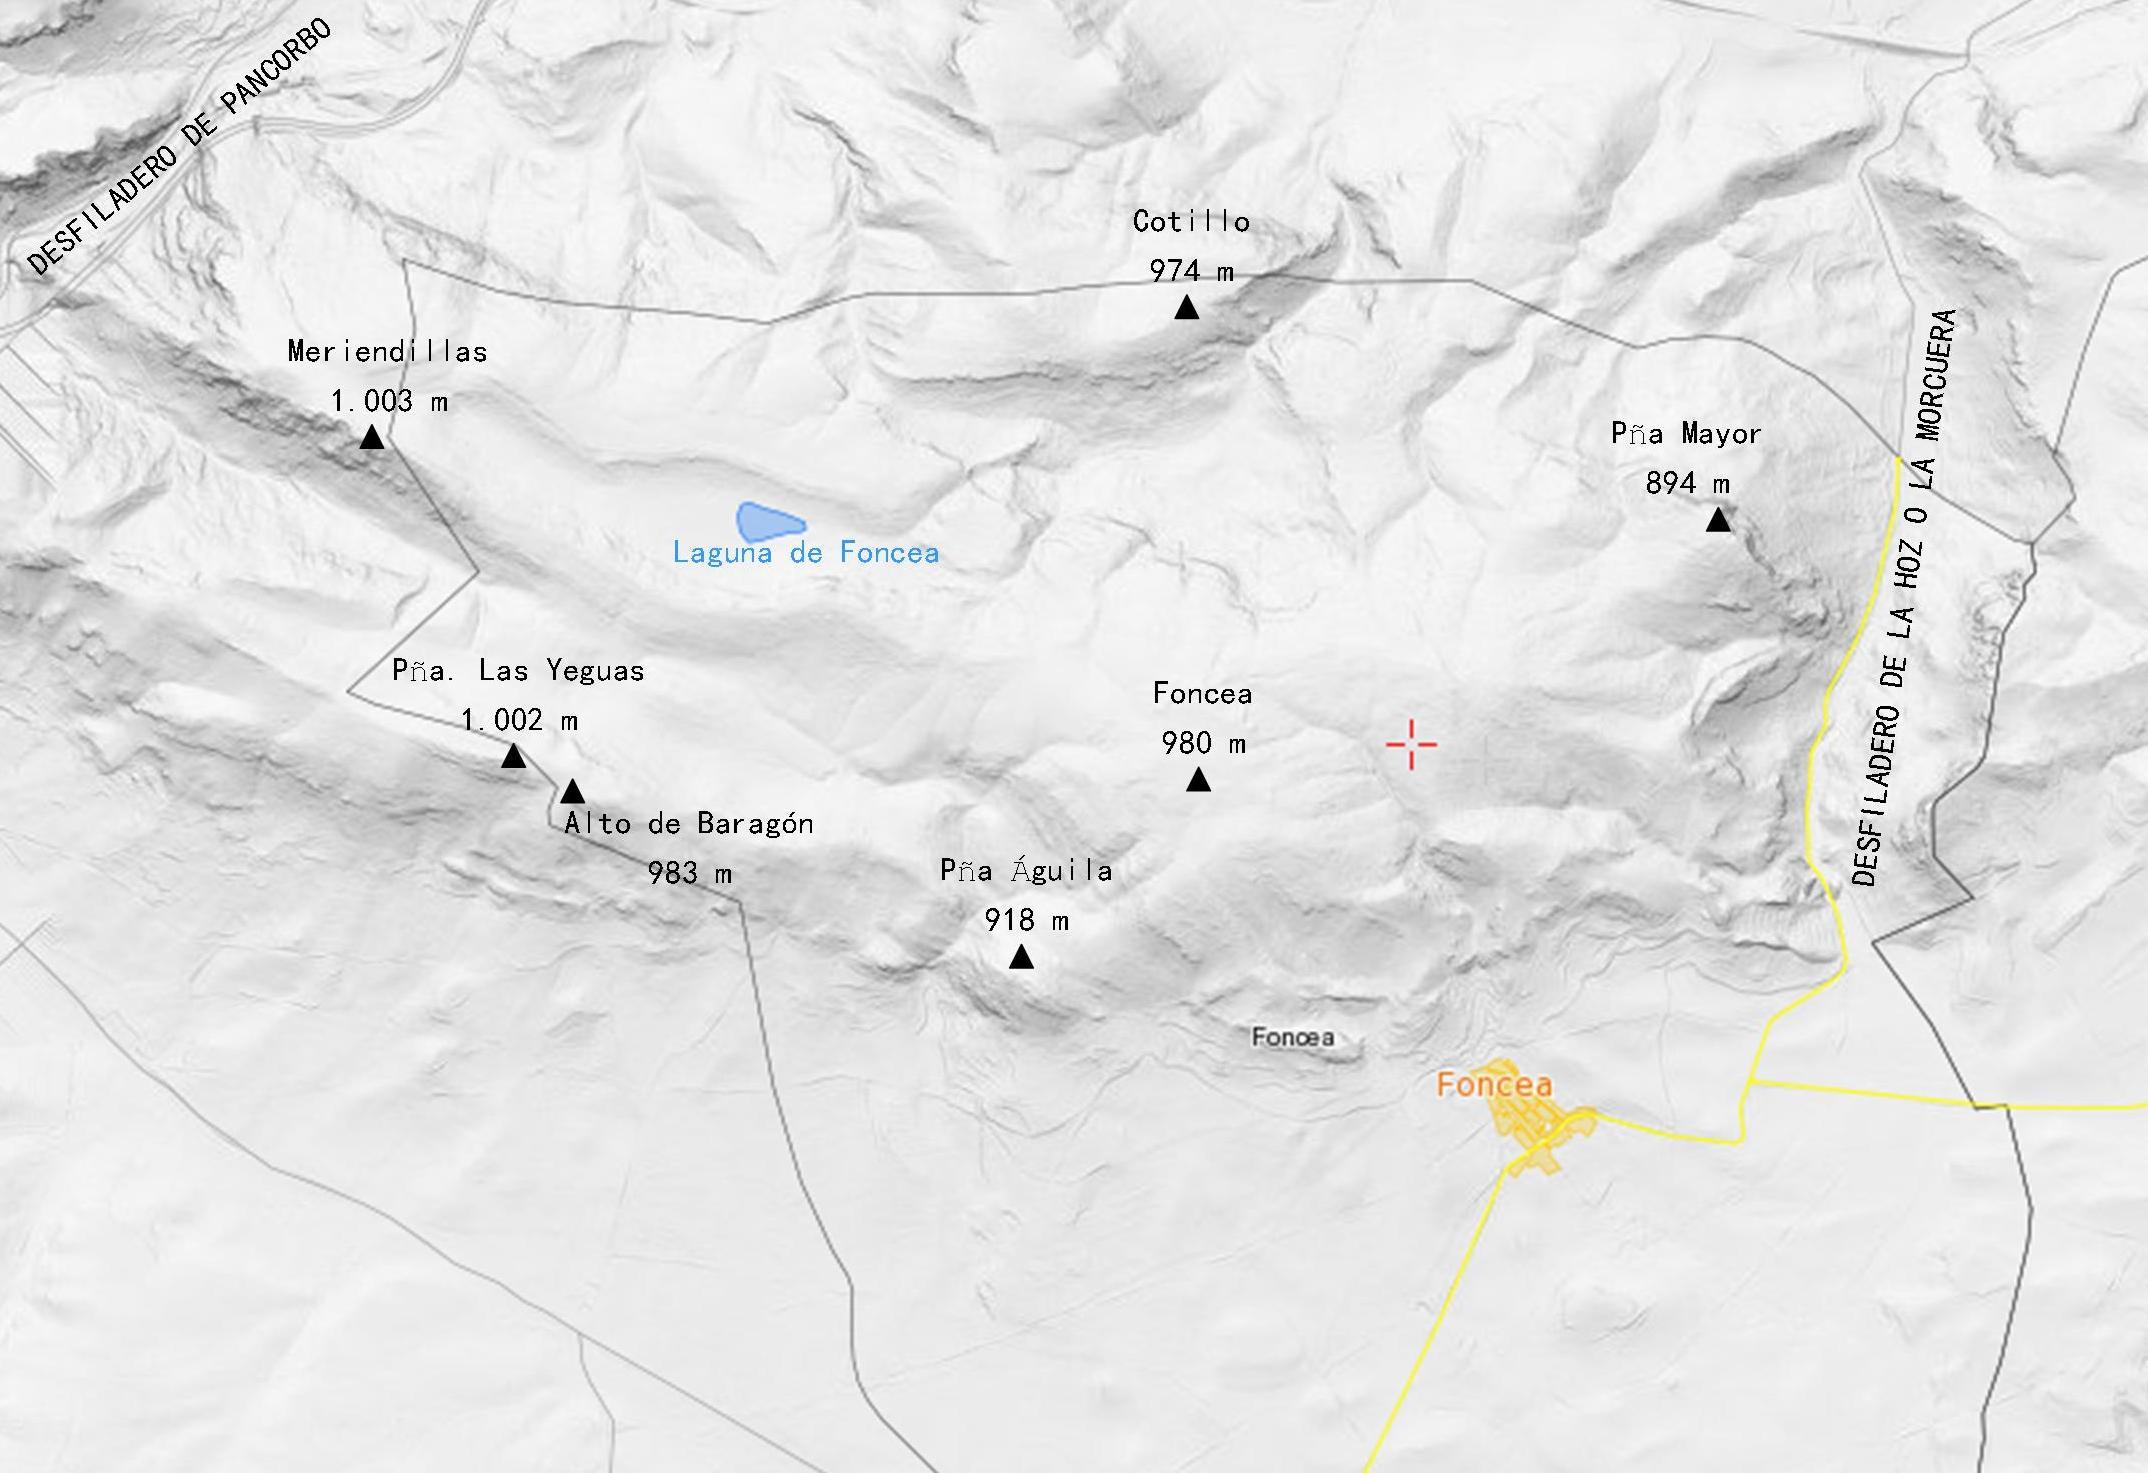 mapa_relieve_monte_foncea_obarenes_guia_montaña_la_rioja